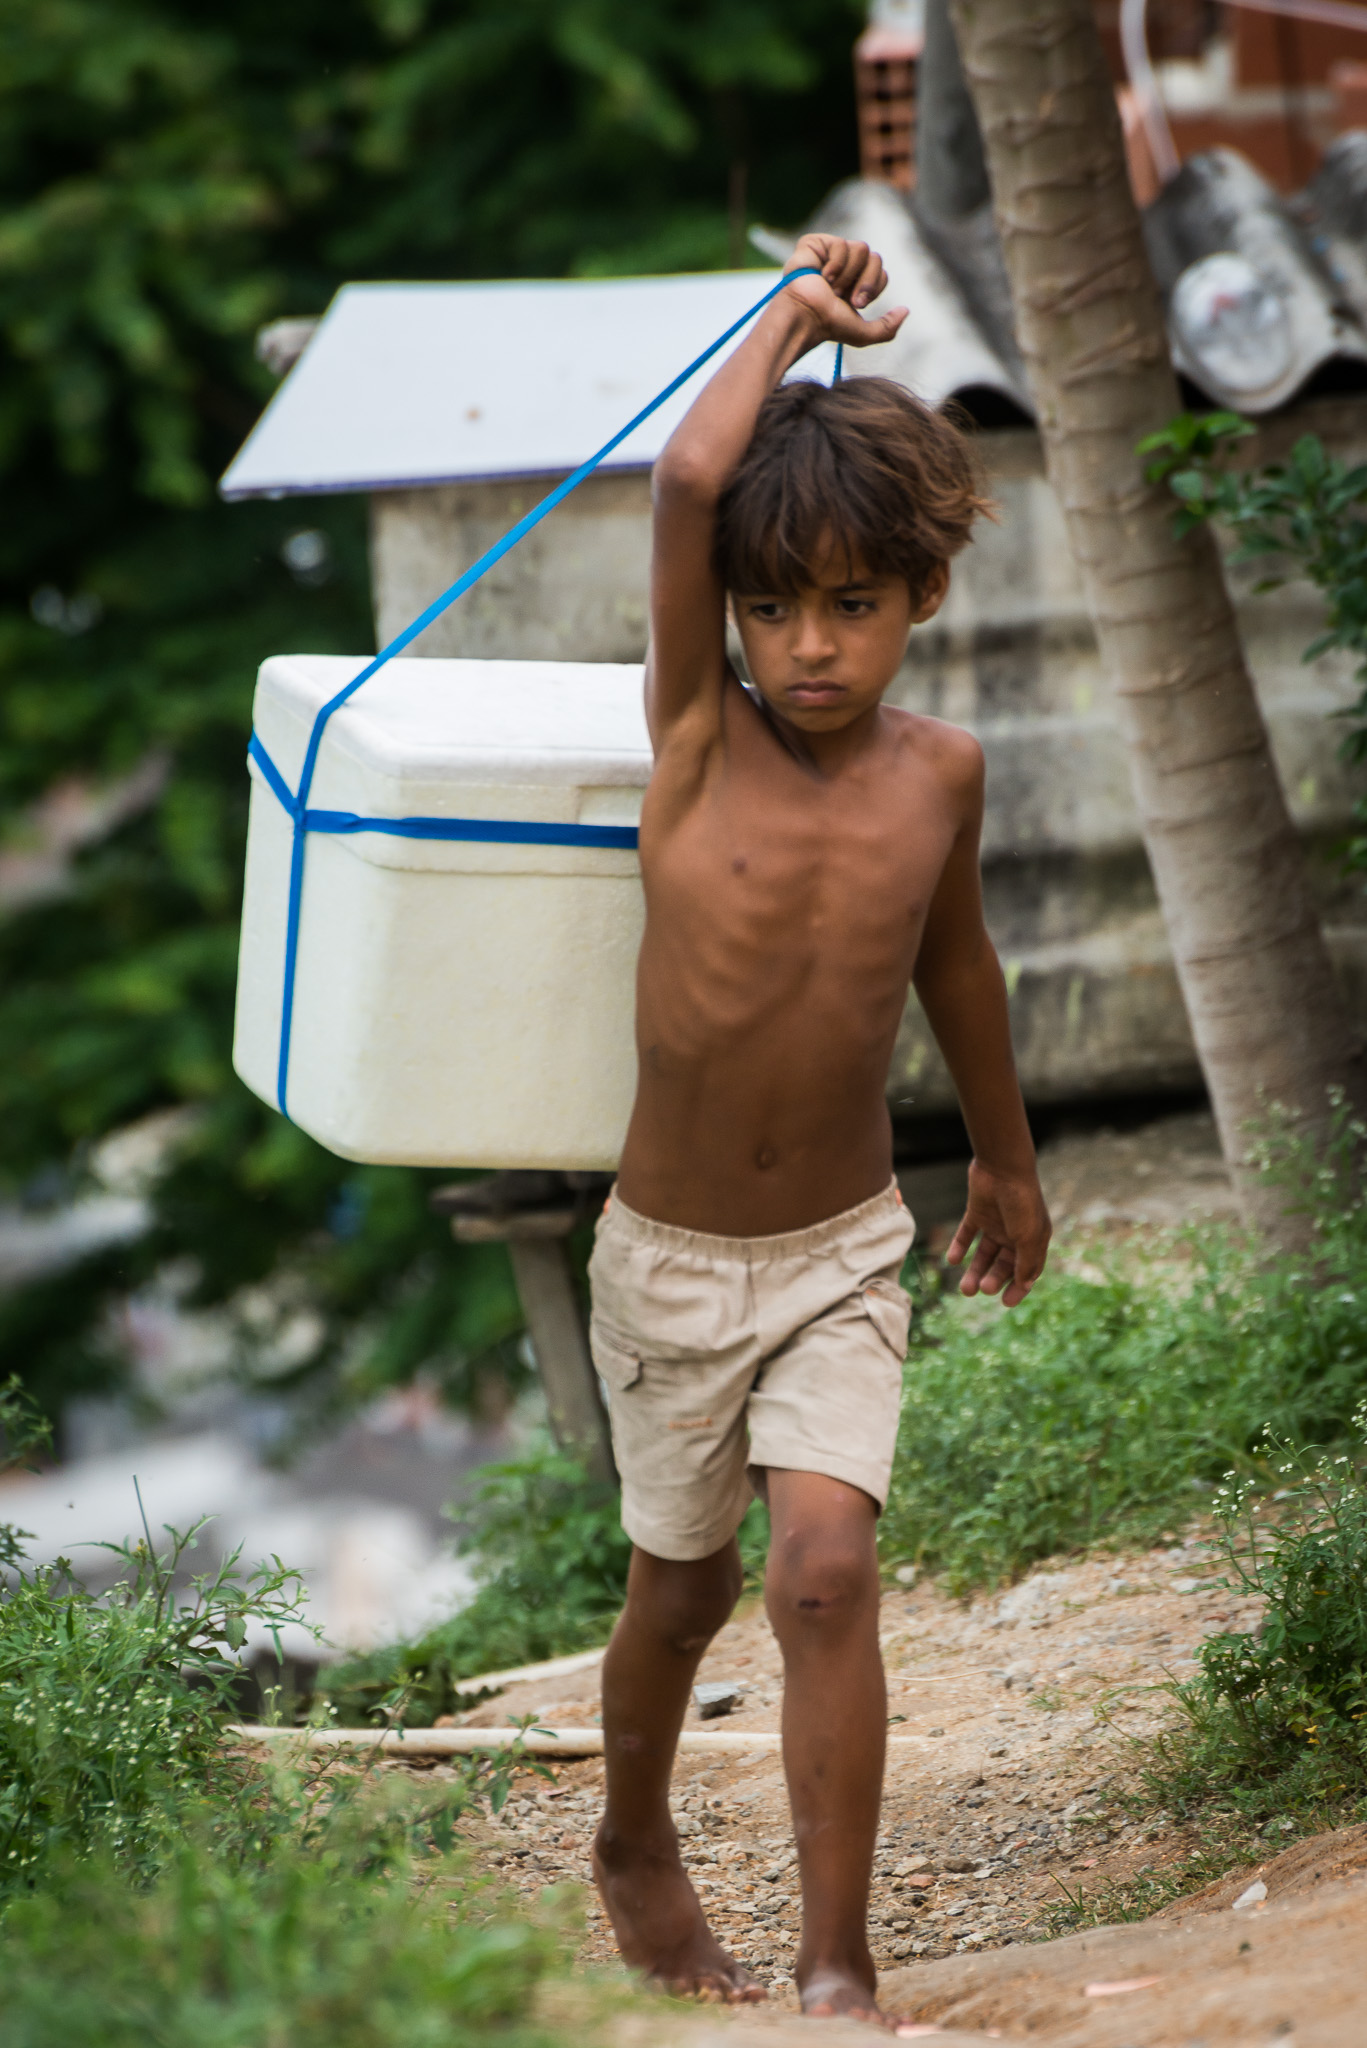 Selling Water, Alemao, Rio de Janeiro, Brasil